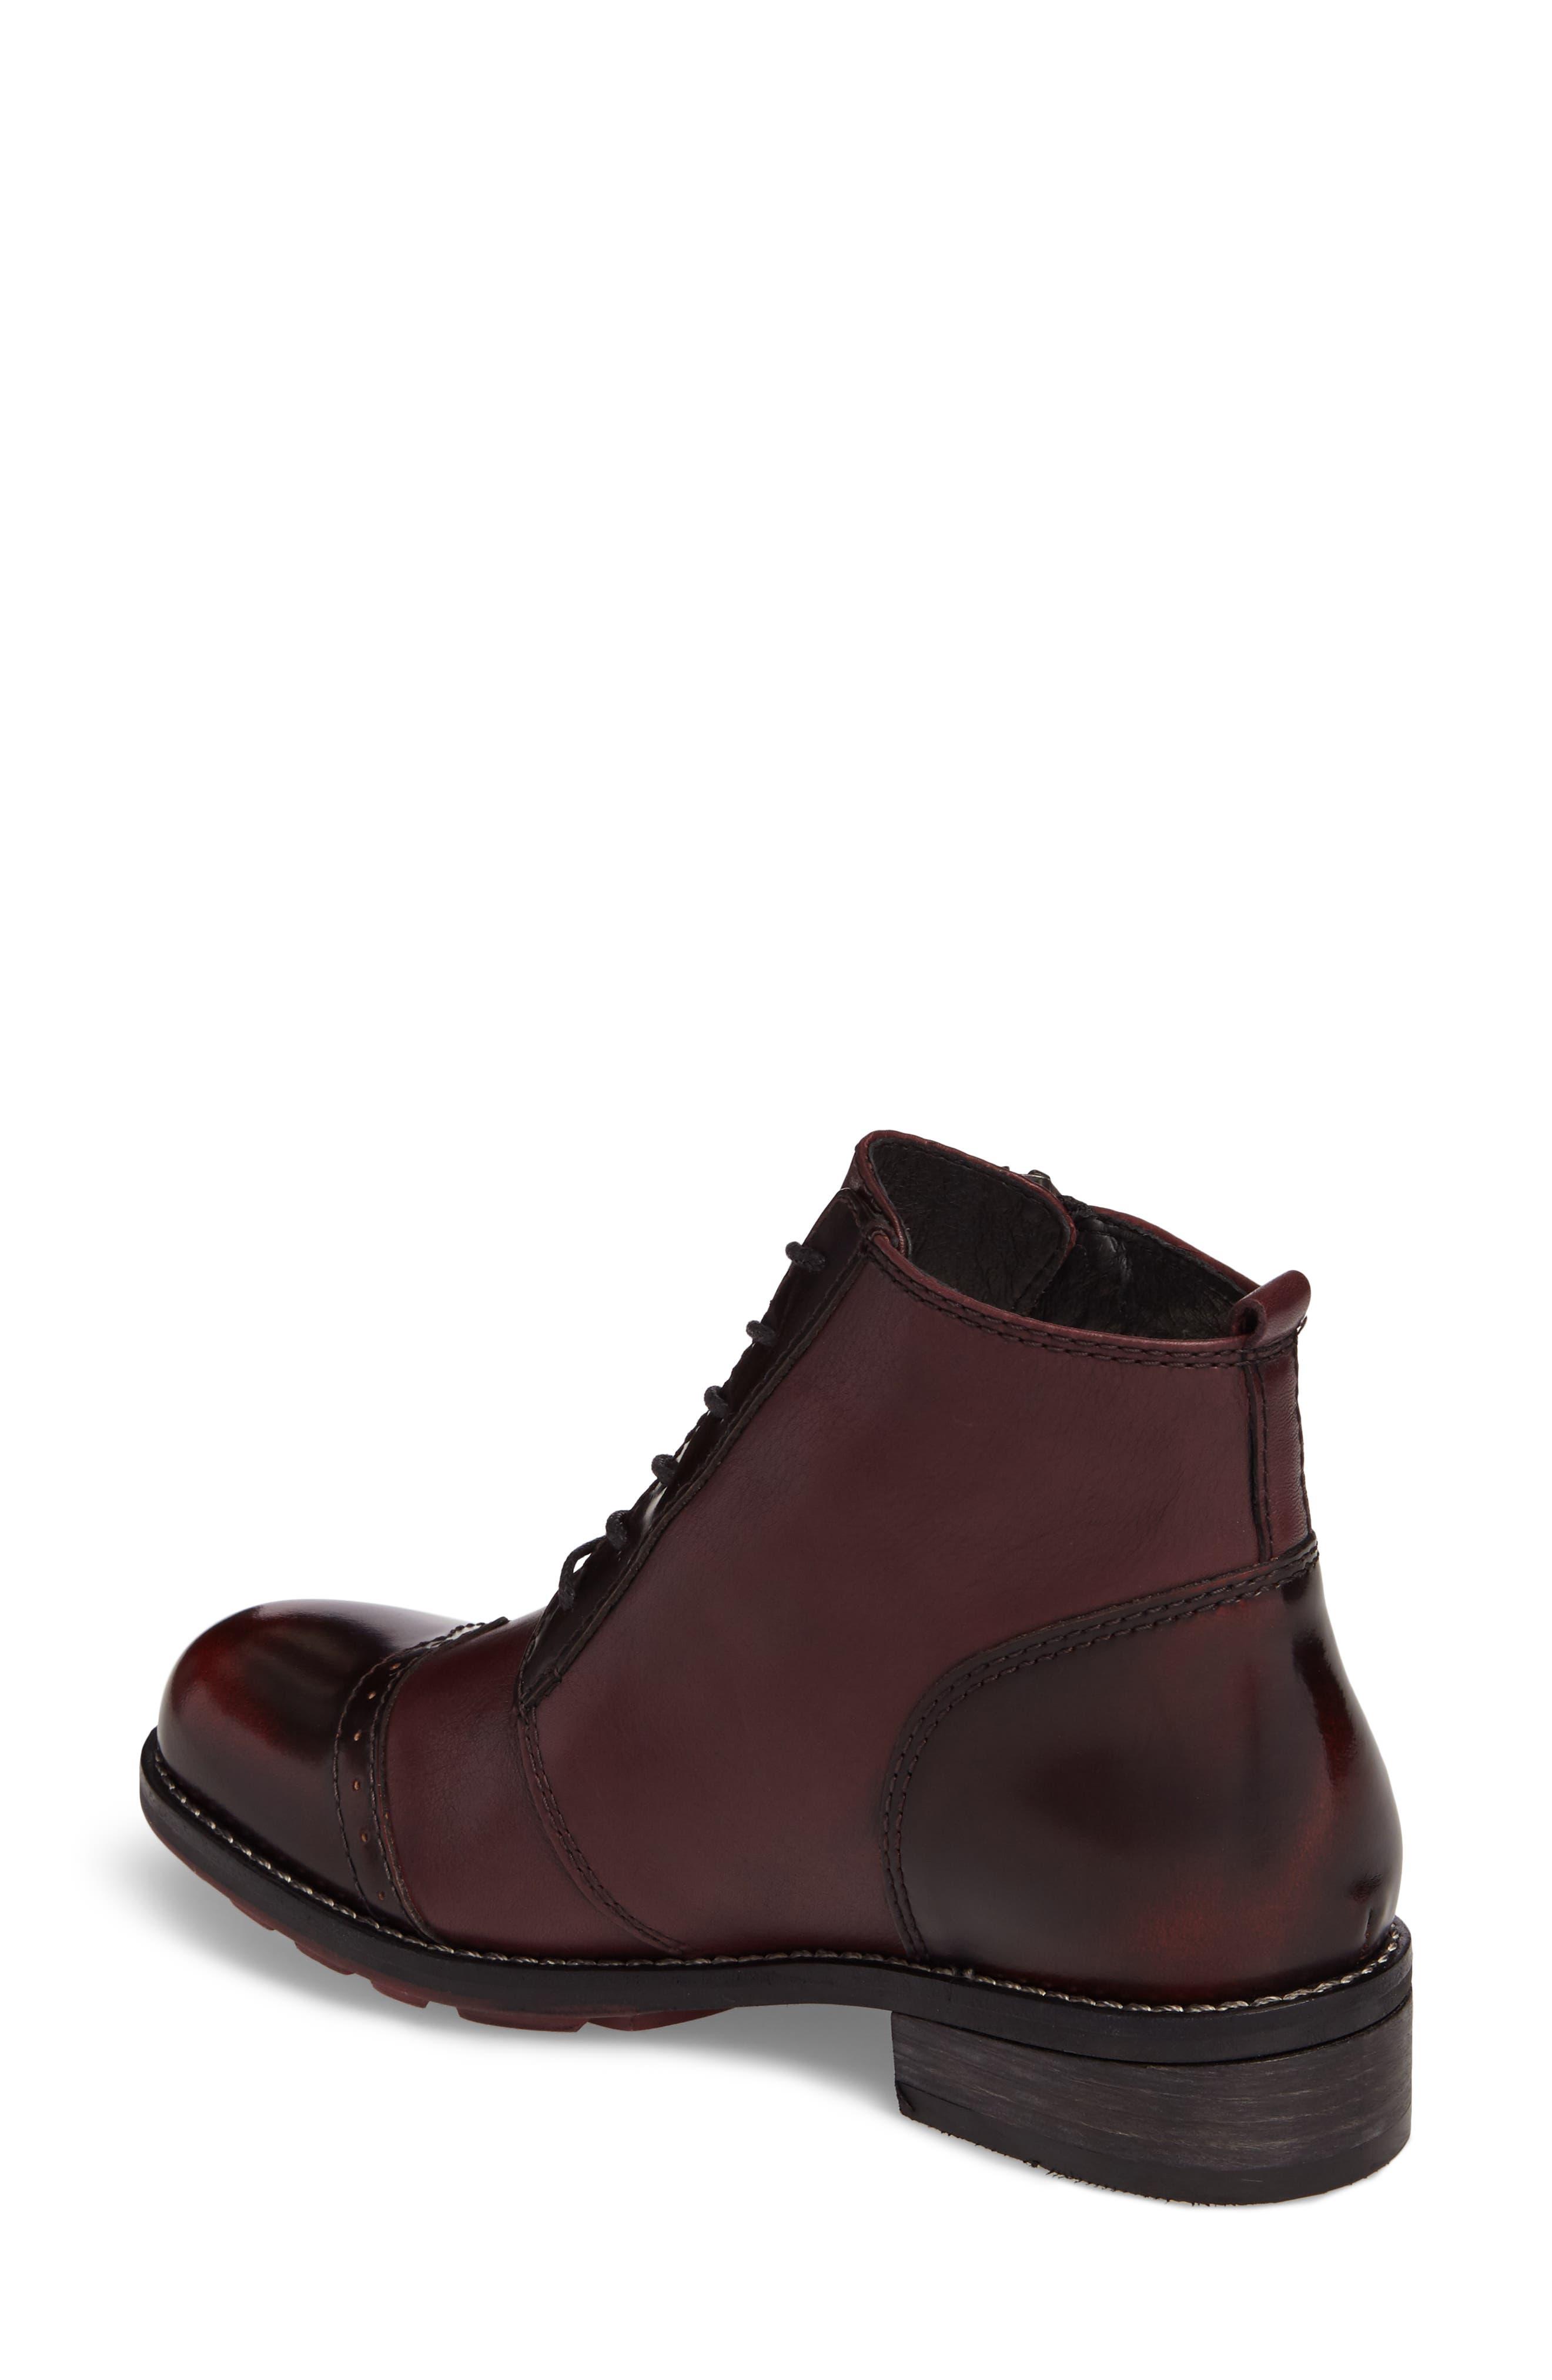 Millstream Boot,                             Alternate thumbnail 2, color,                             Bordo Leather